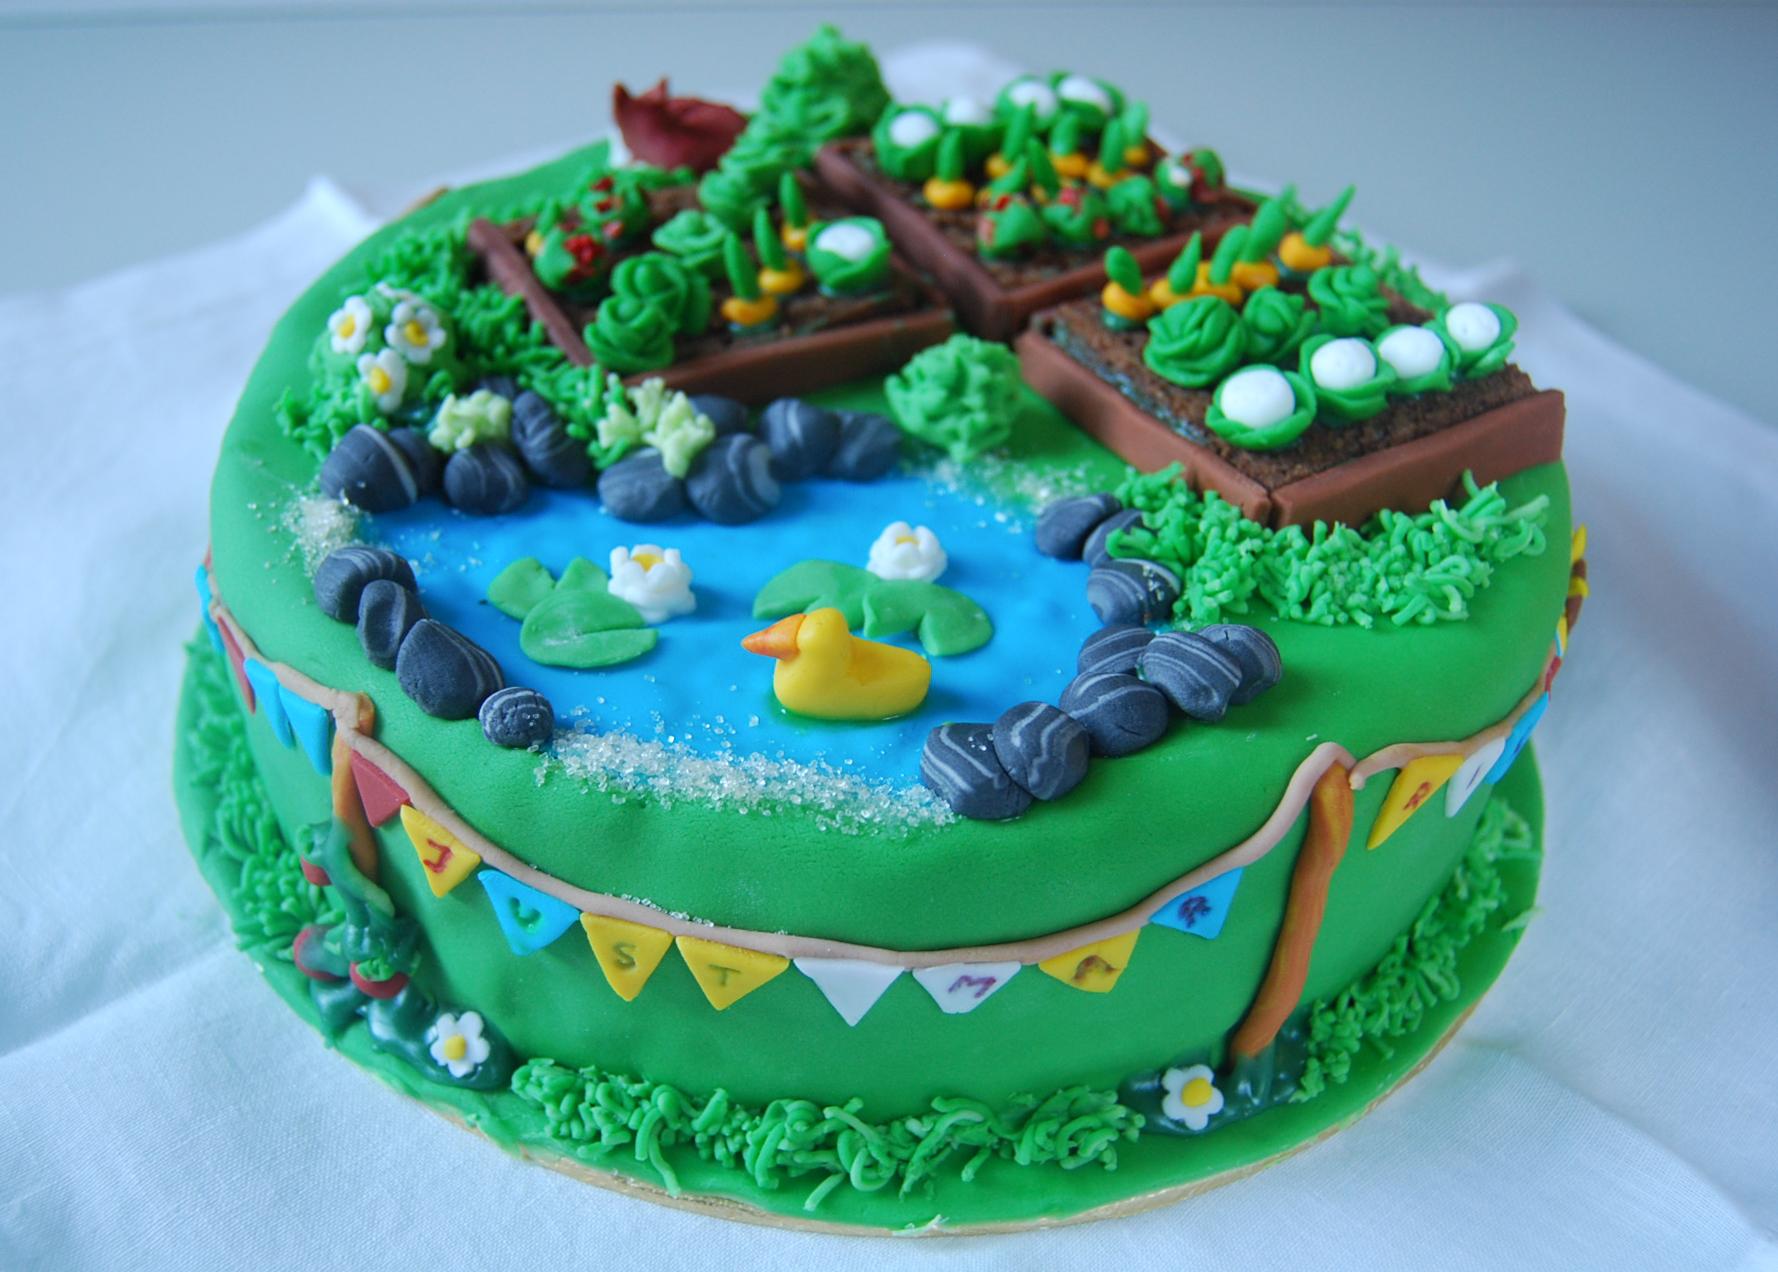 Allotment-themed Cake